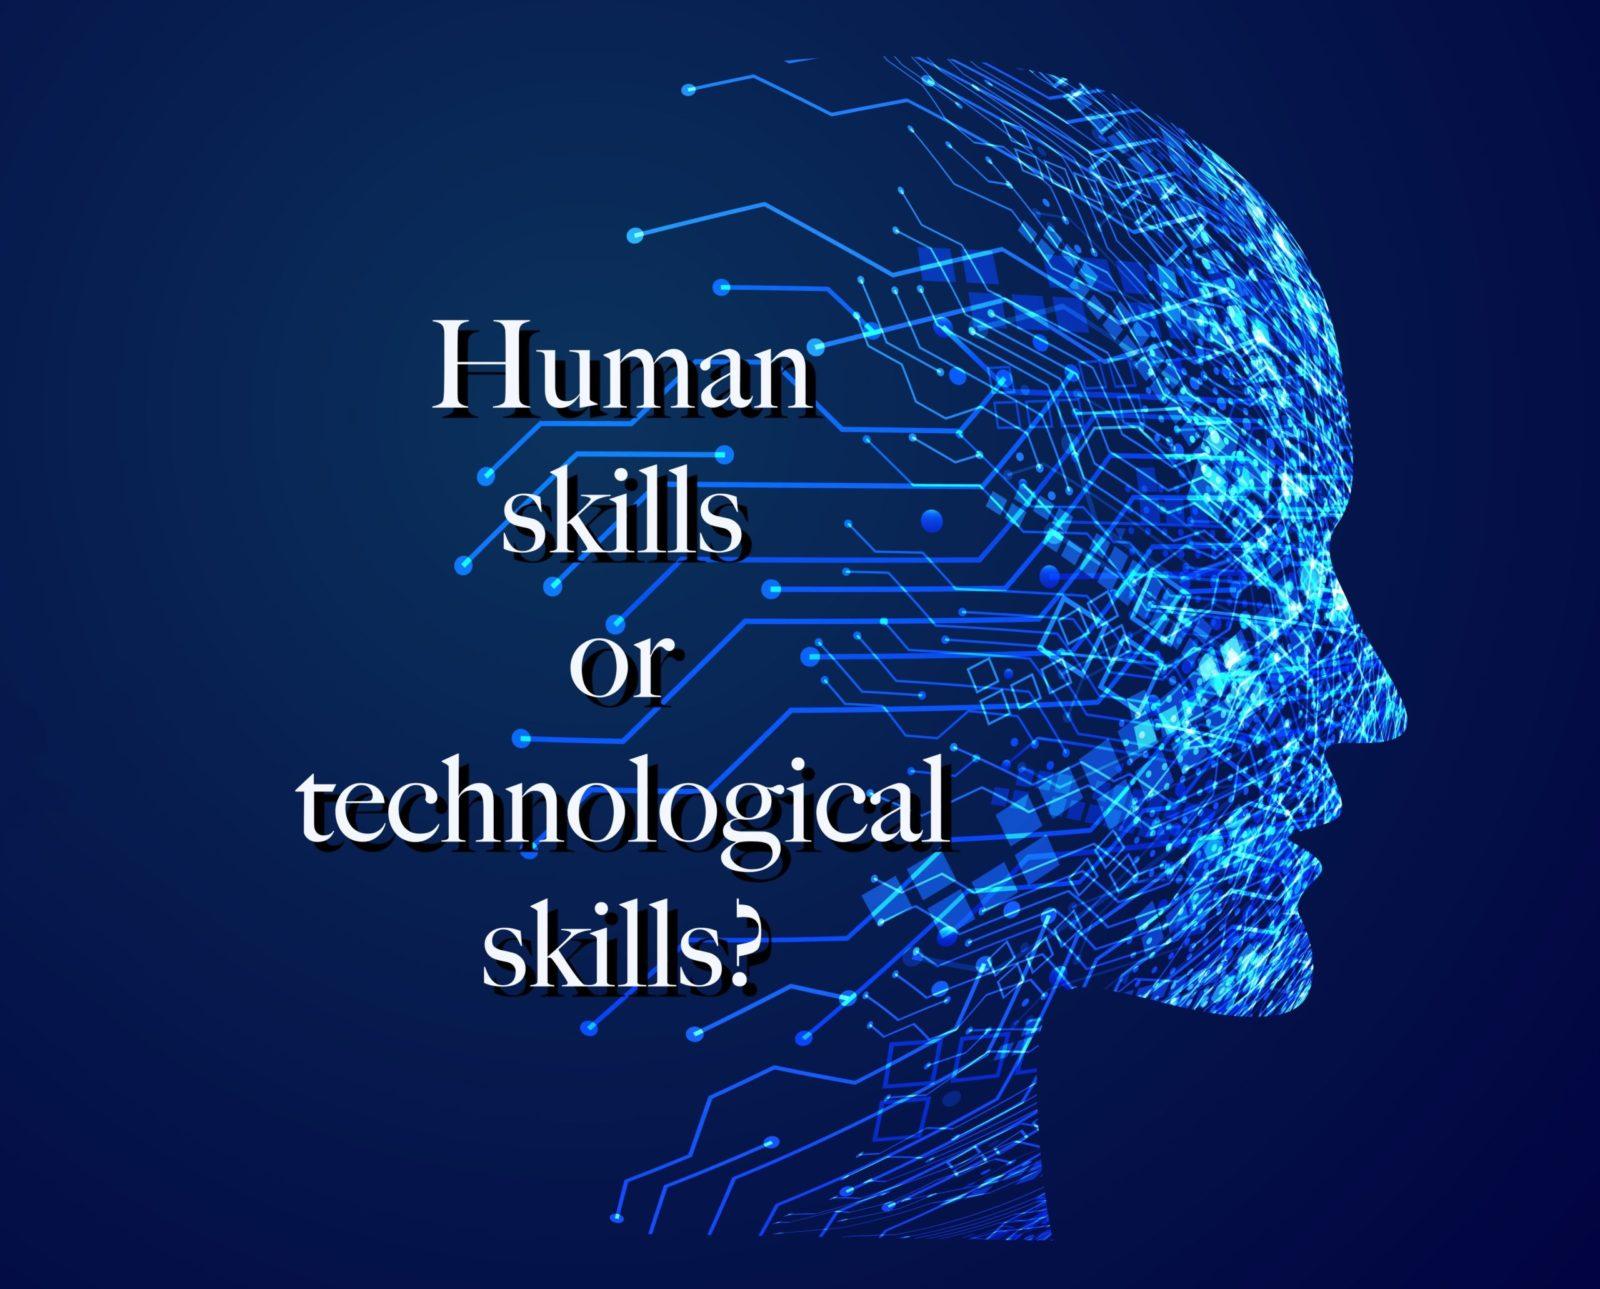 (Digital technology face artificial intelligence Free Vector, 2019)